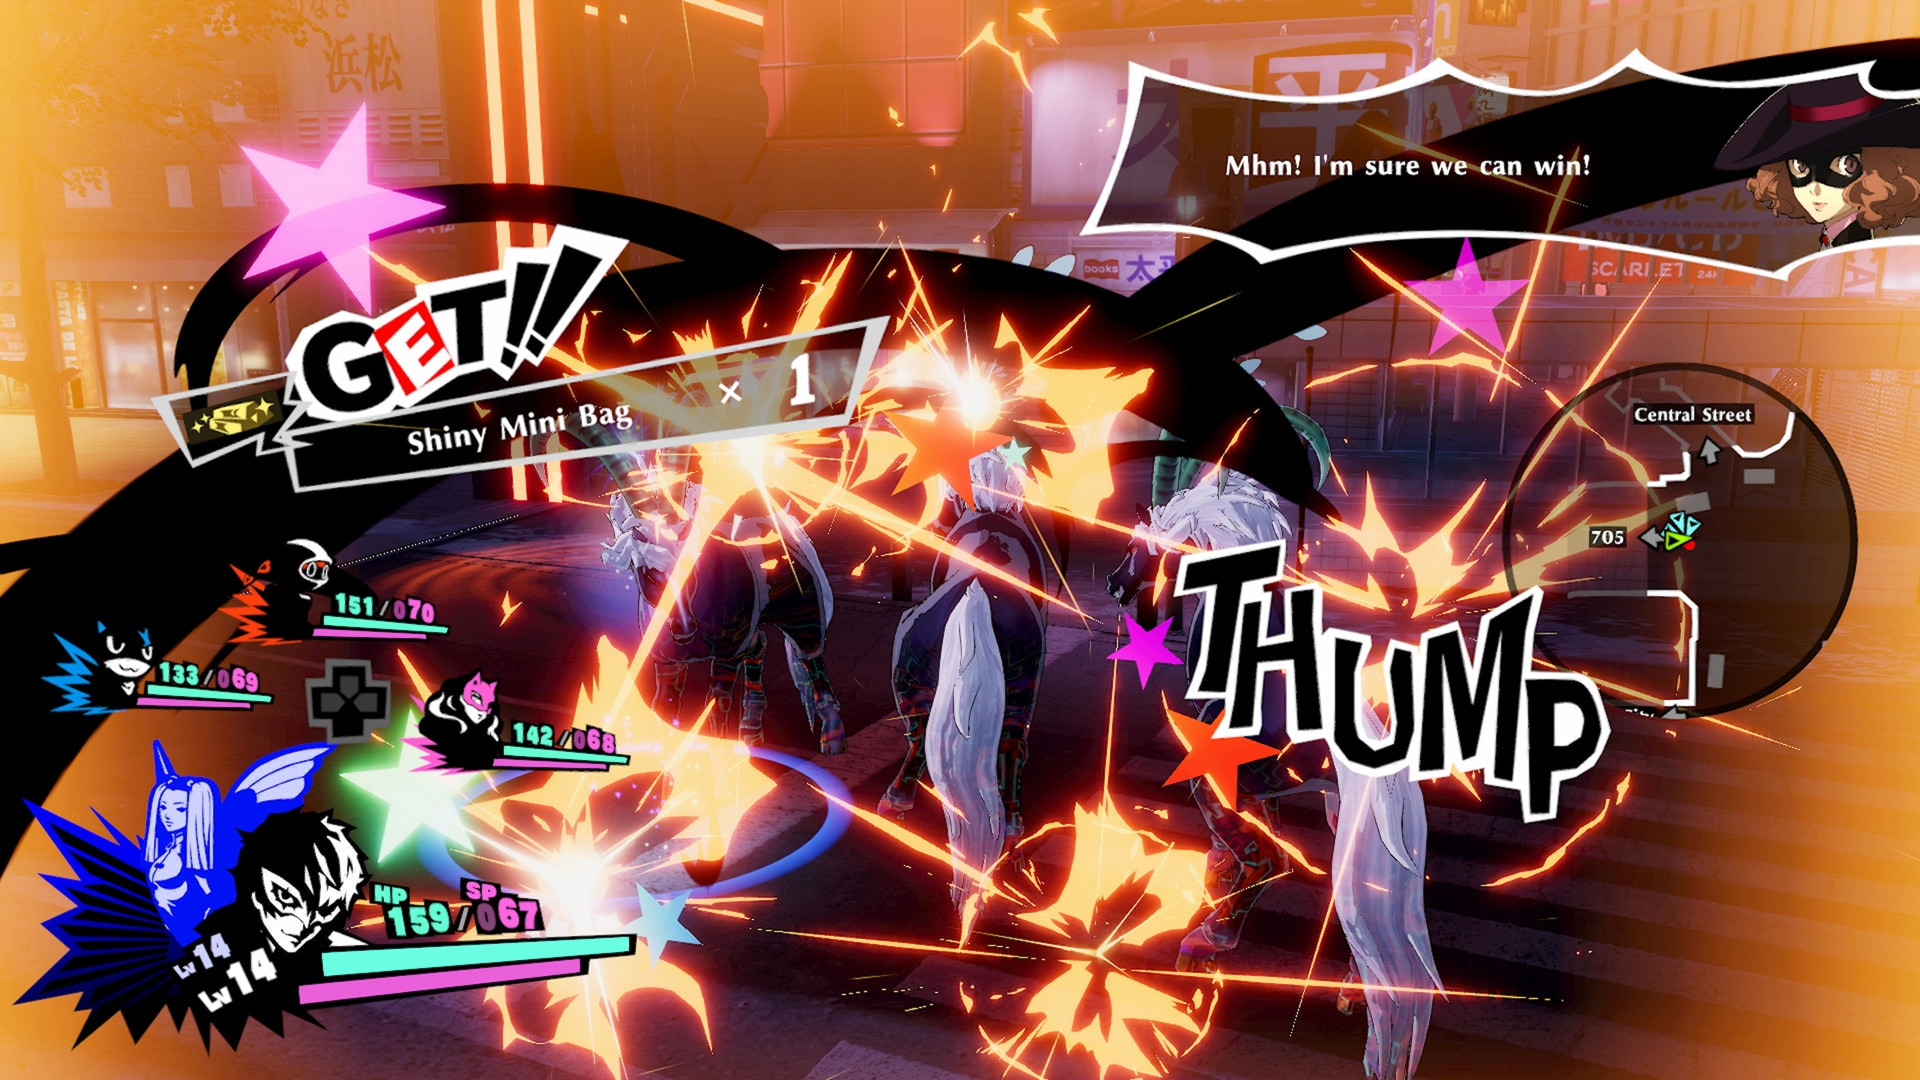 Persona 5 Strikers (PC) - Steam Key - GLOBAL - 3